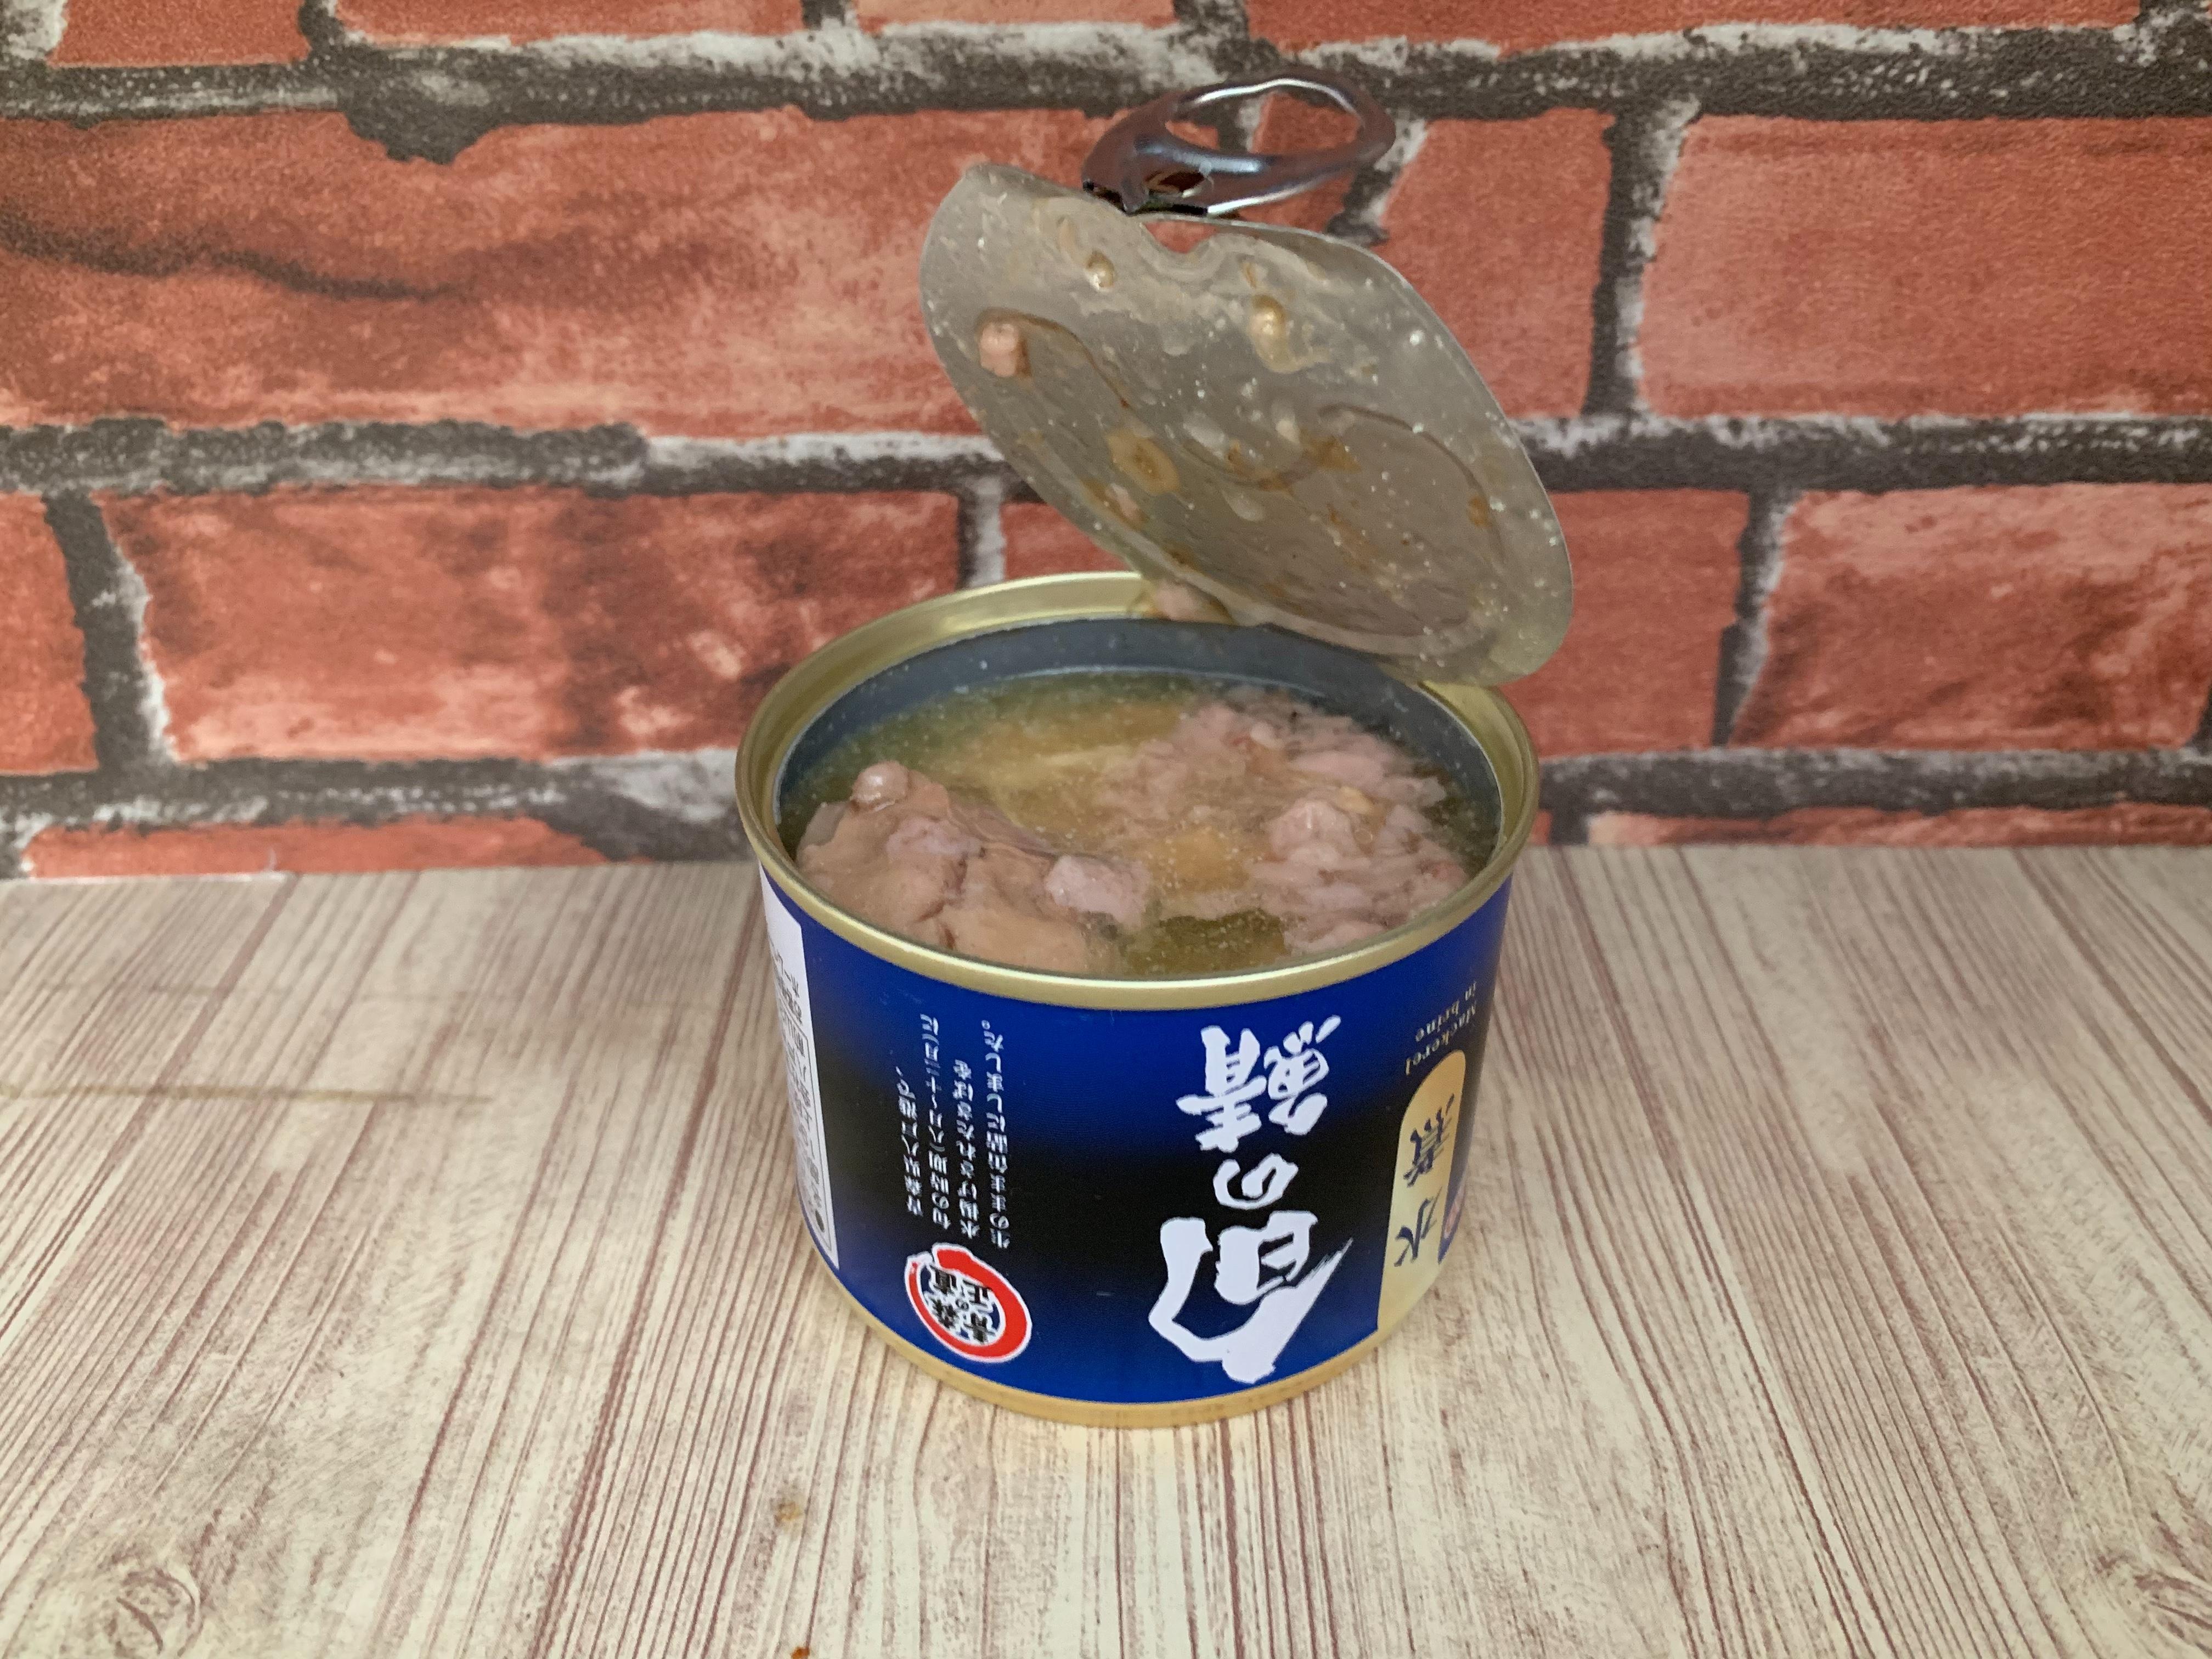 HOKOの八戸港鯖缶「旬の鯖 水煮」を食レポしてみた。【5つ星評価、味】